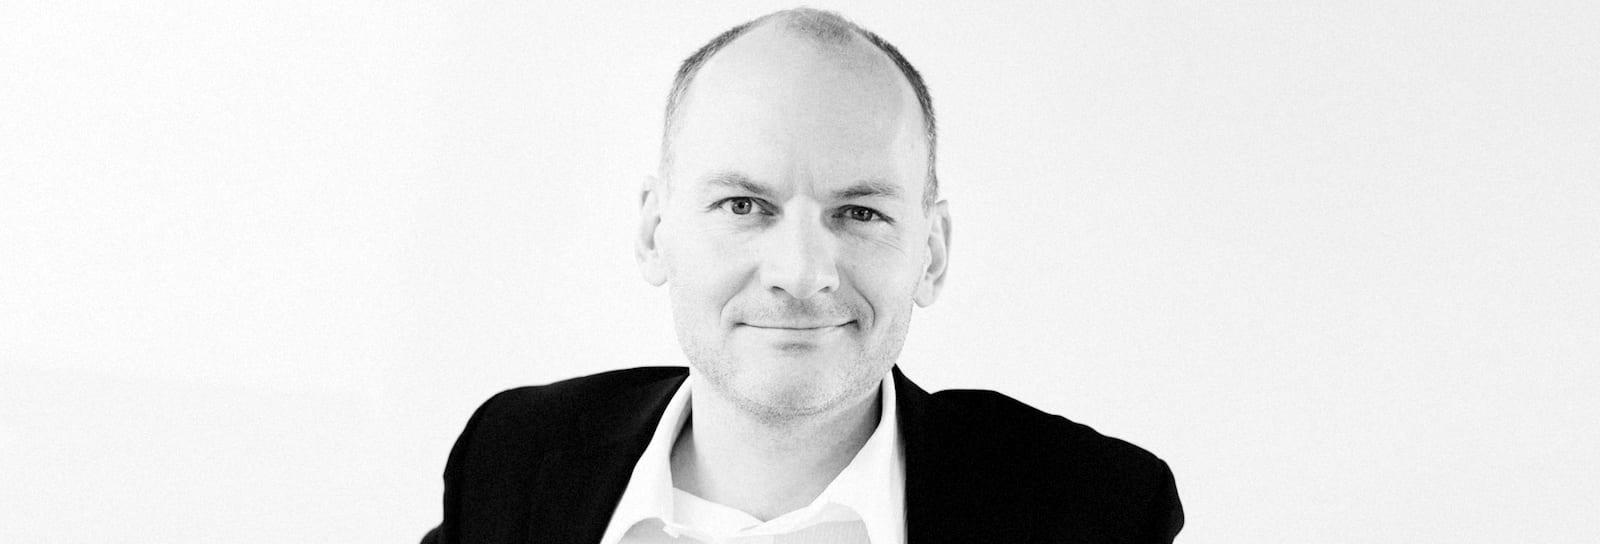 Claus Hembo tilbyder Folsach nyt job